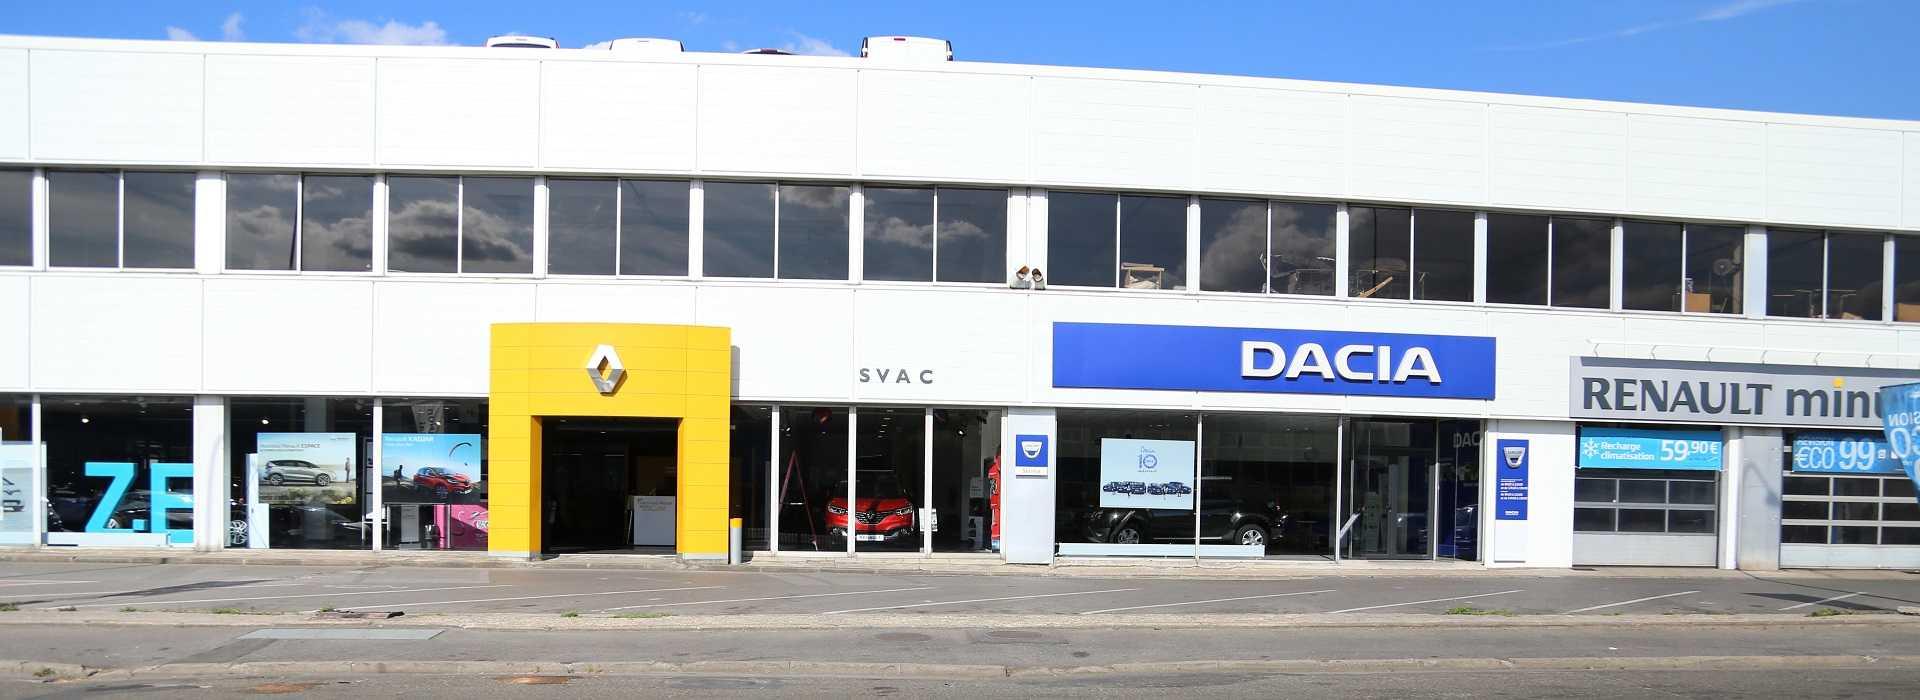 Dacia Créteil